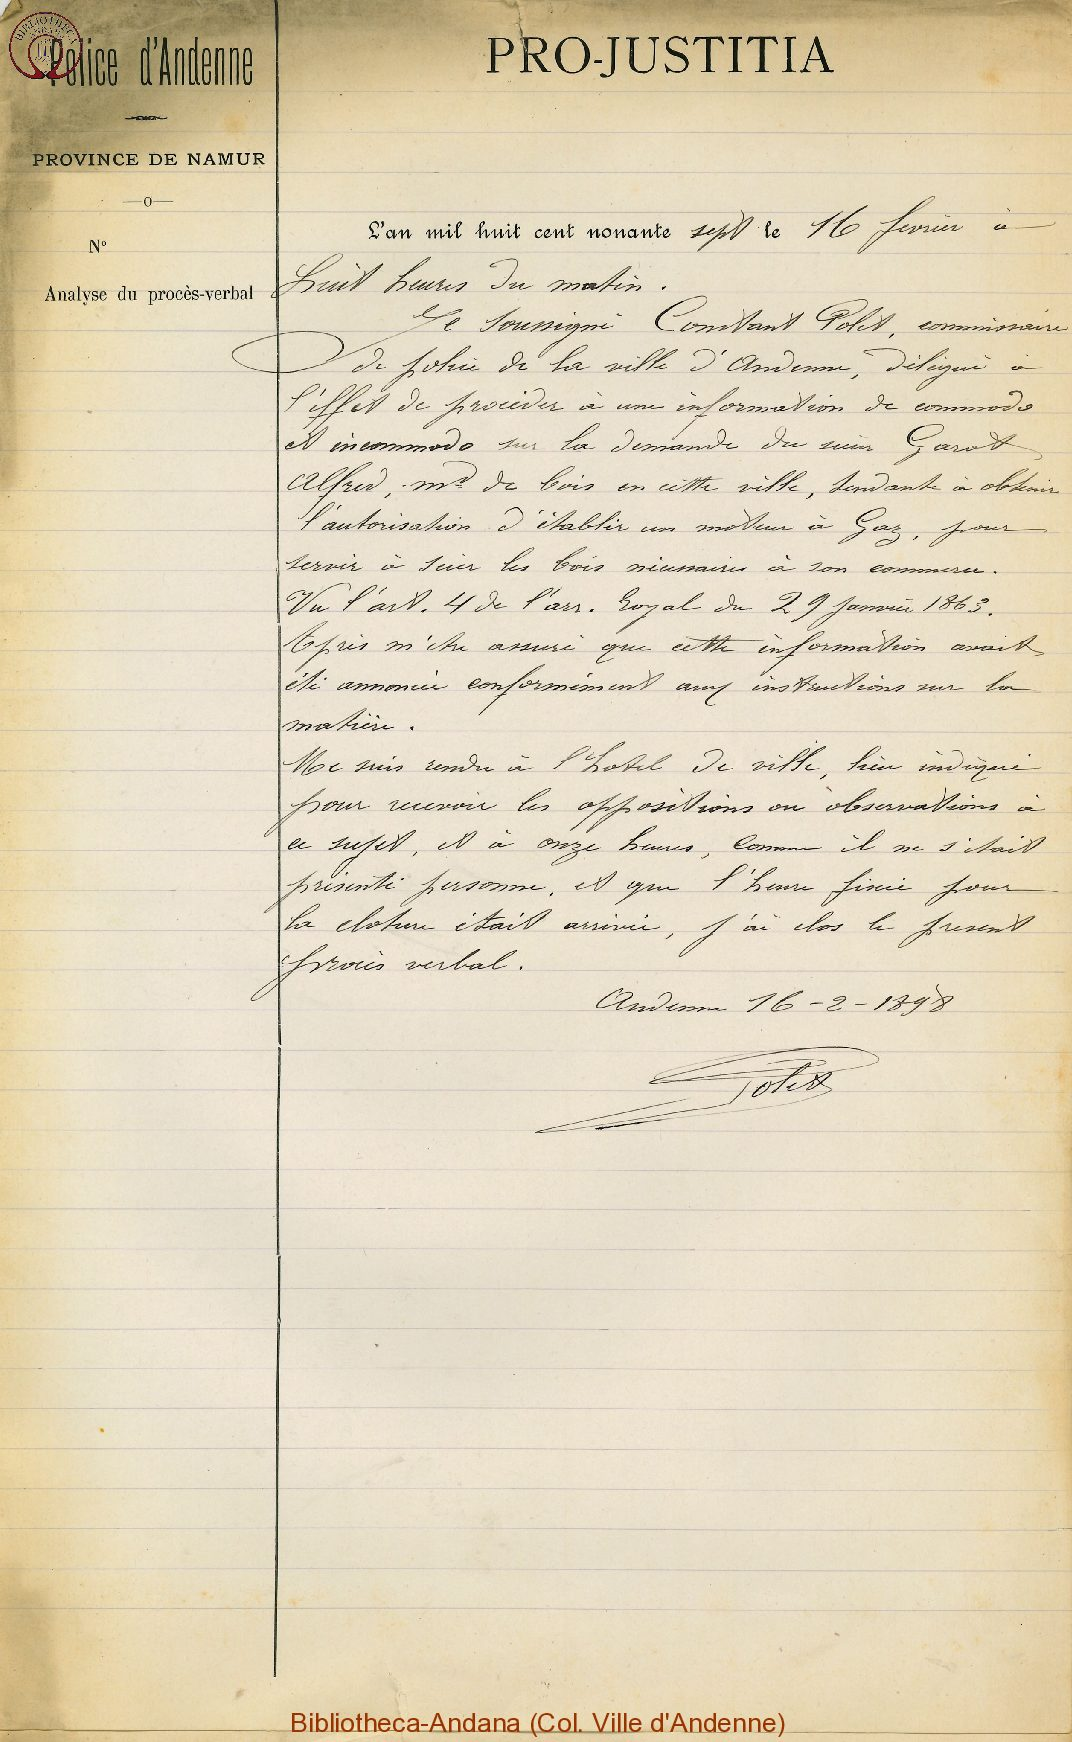 1898-02-16